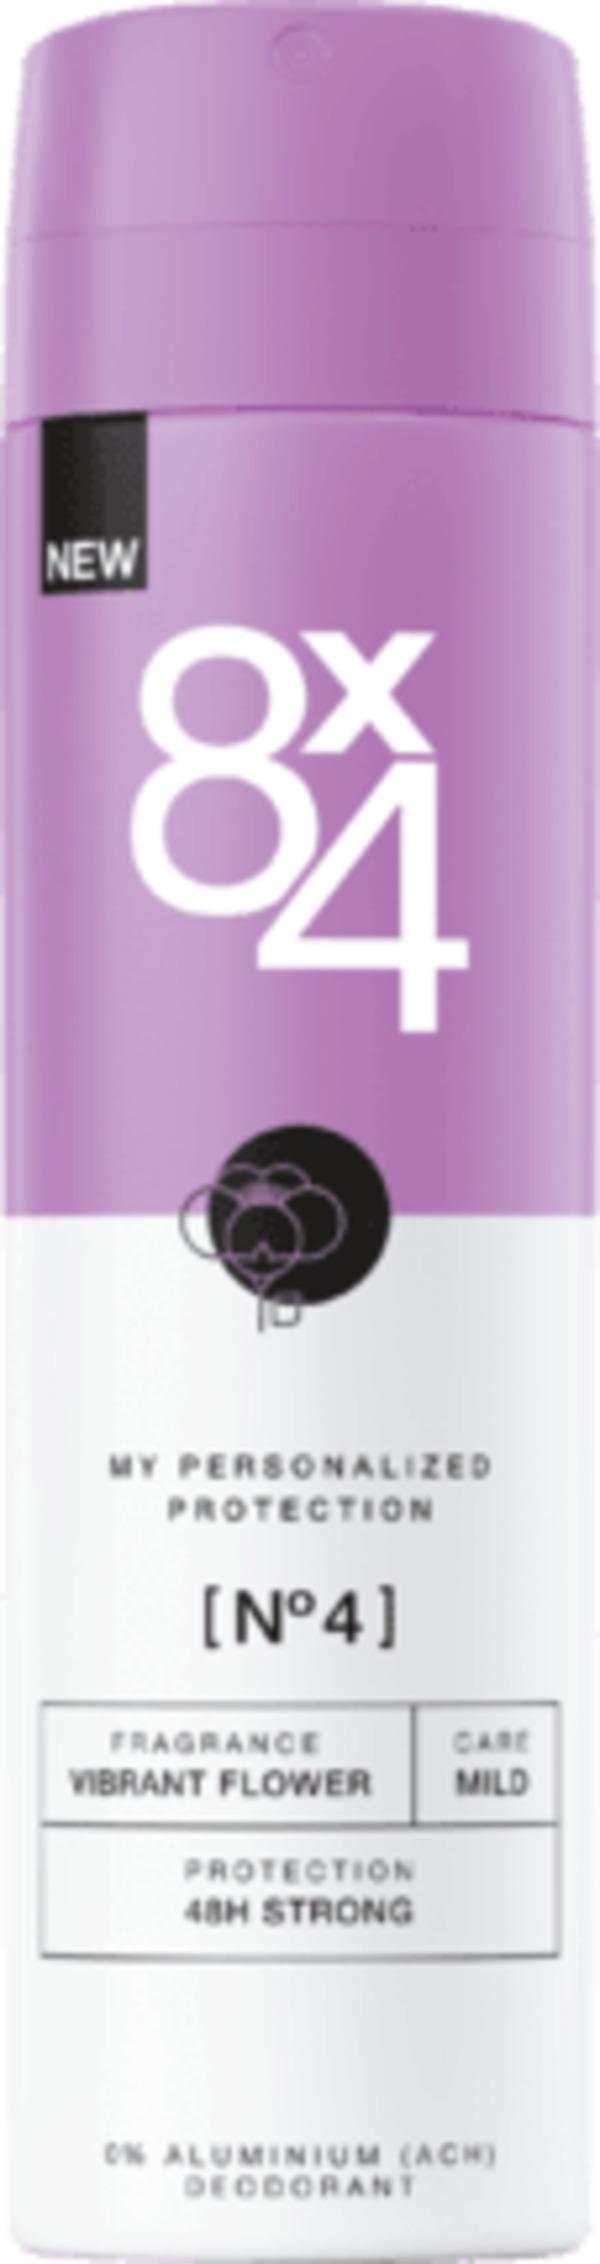 8x4 women Deo Spray Deodorant No.4 Vibrant Flower